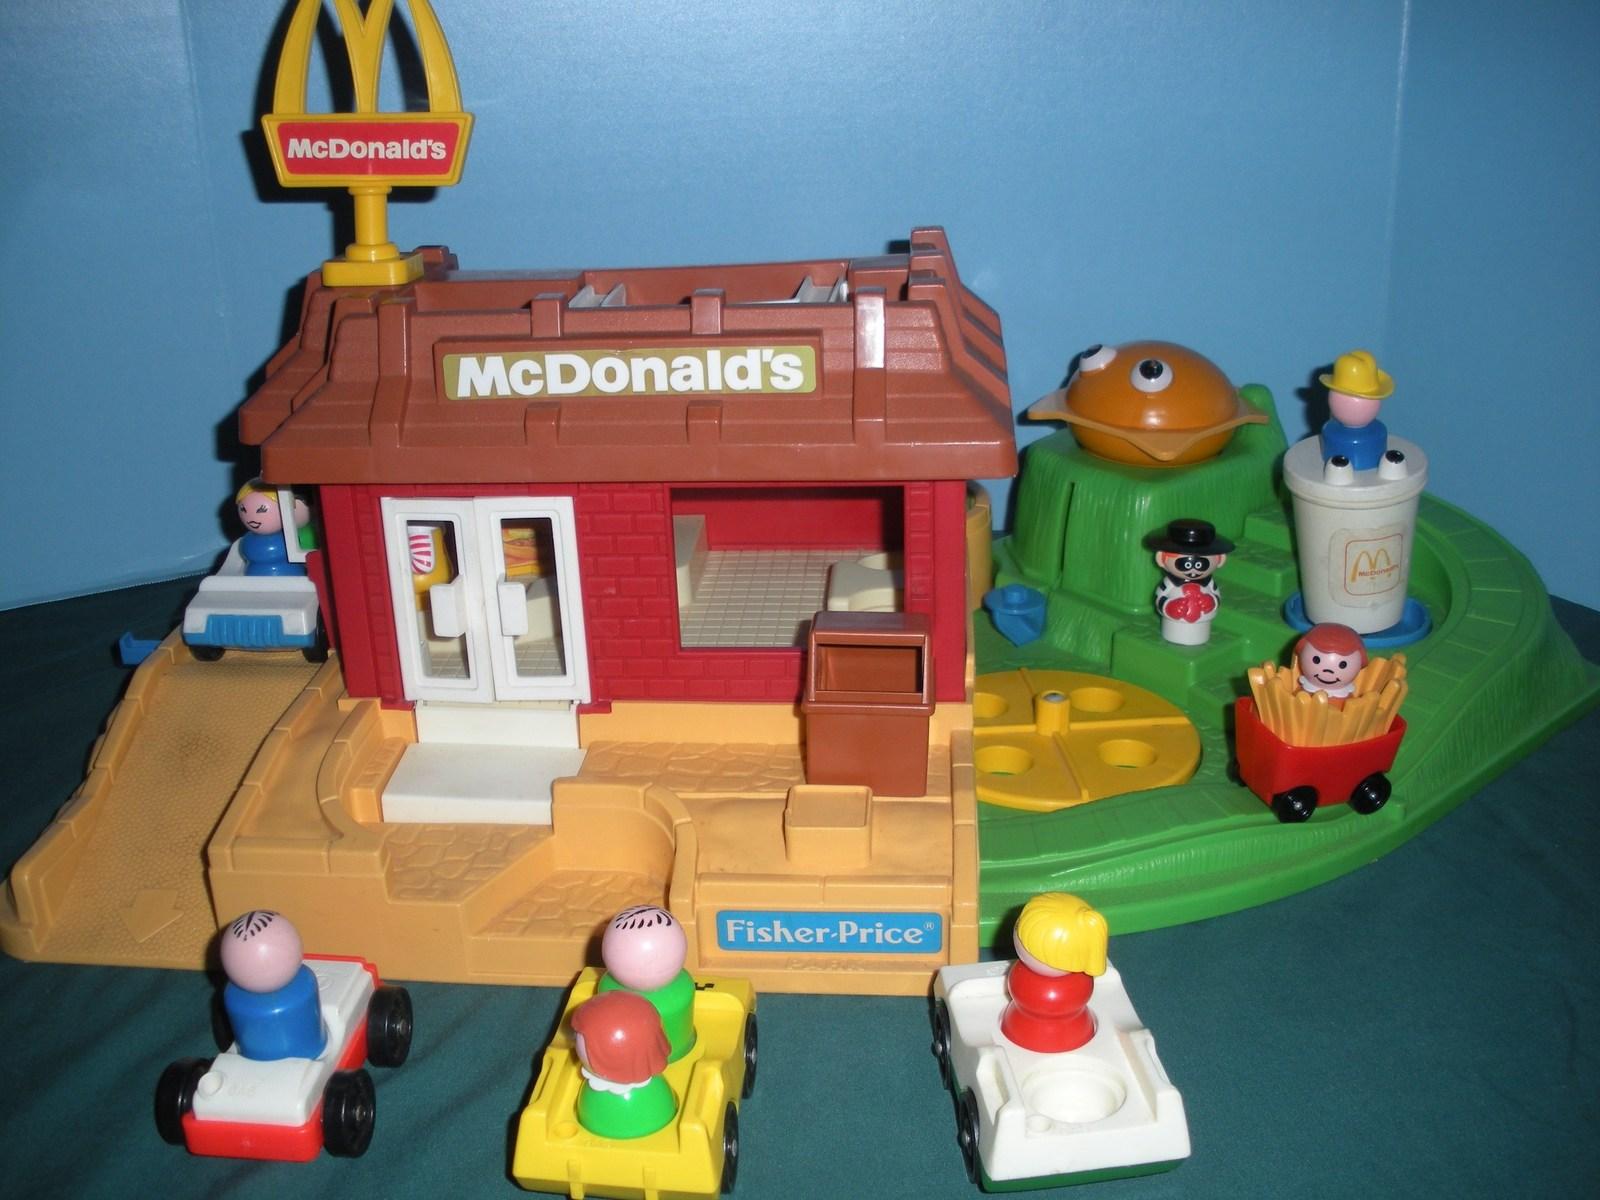 Vintage Fisher Price #2552 McDonald's Play Set Complete + BONUS!/VG++-EXC (N) image 6